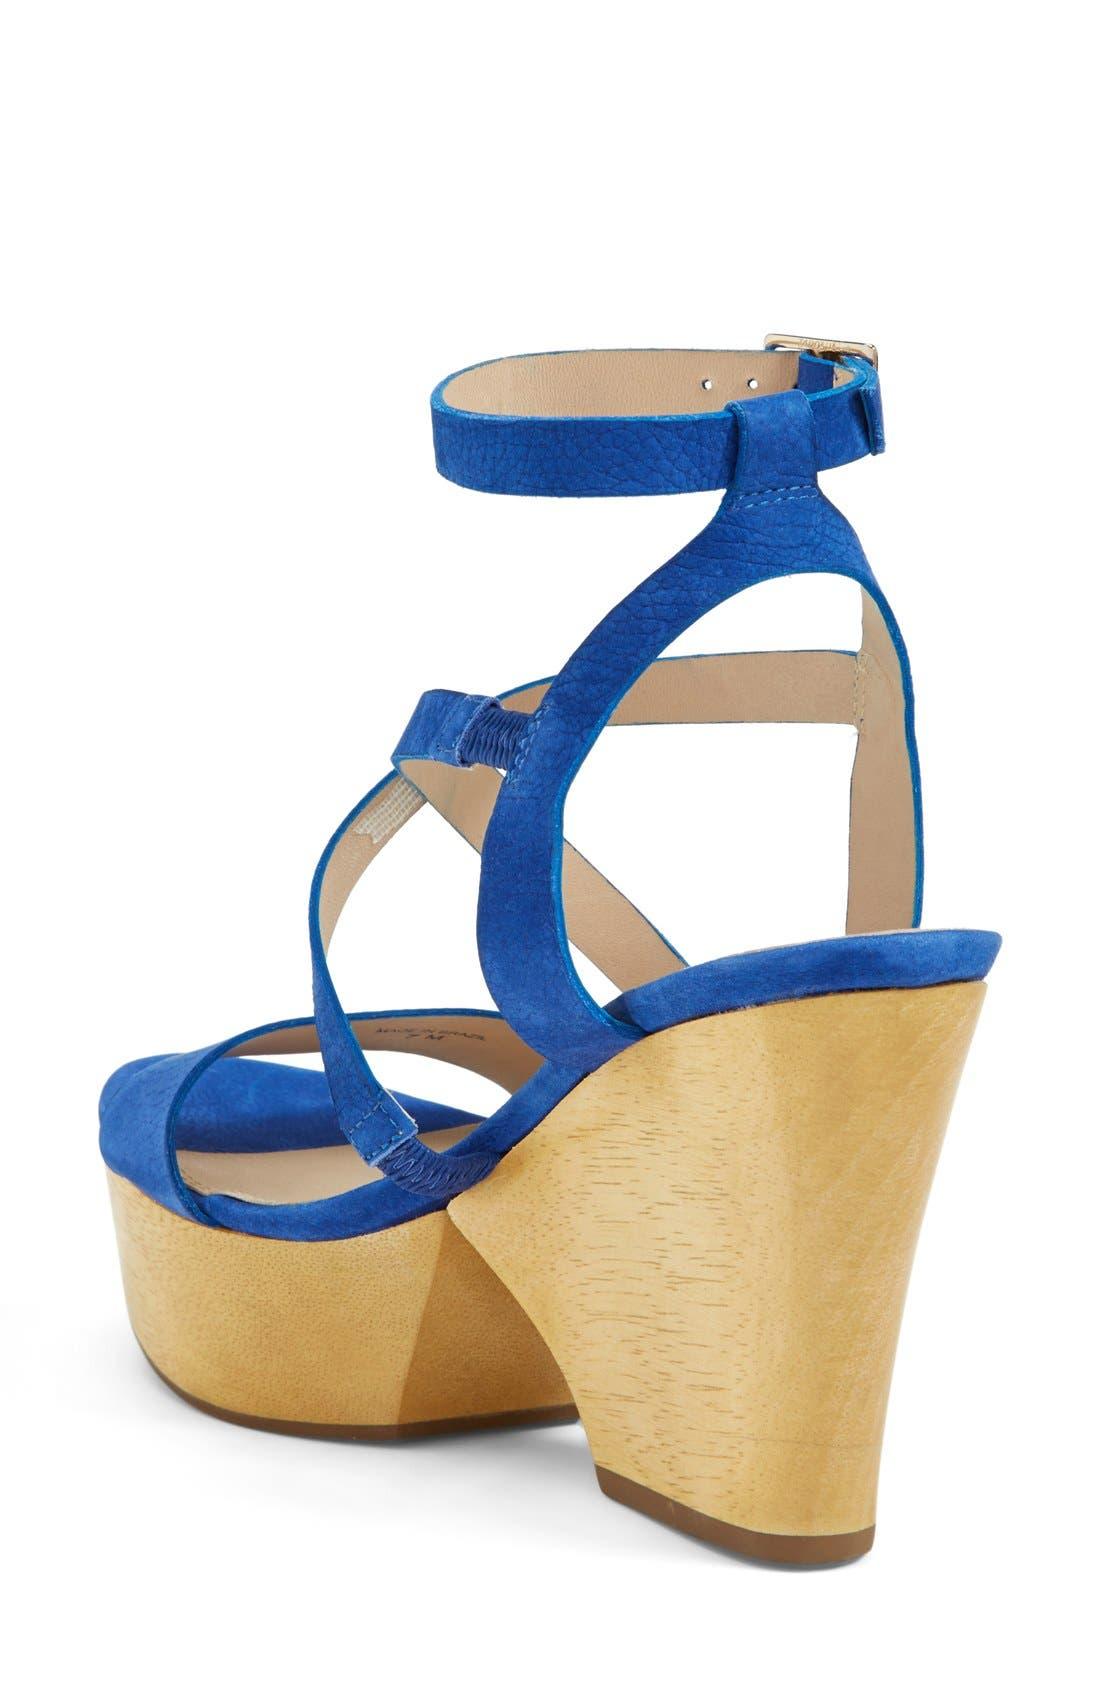 Alternate Image 2  - Diane von Furstenberg 'Lamille' Leather Platform Wedge Sandal (Women)